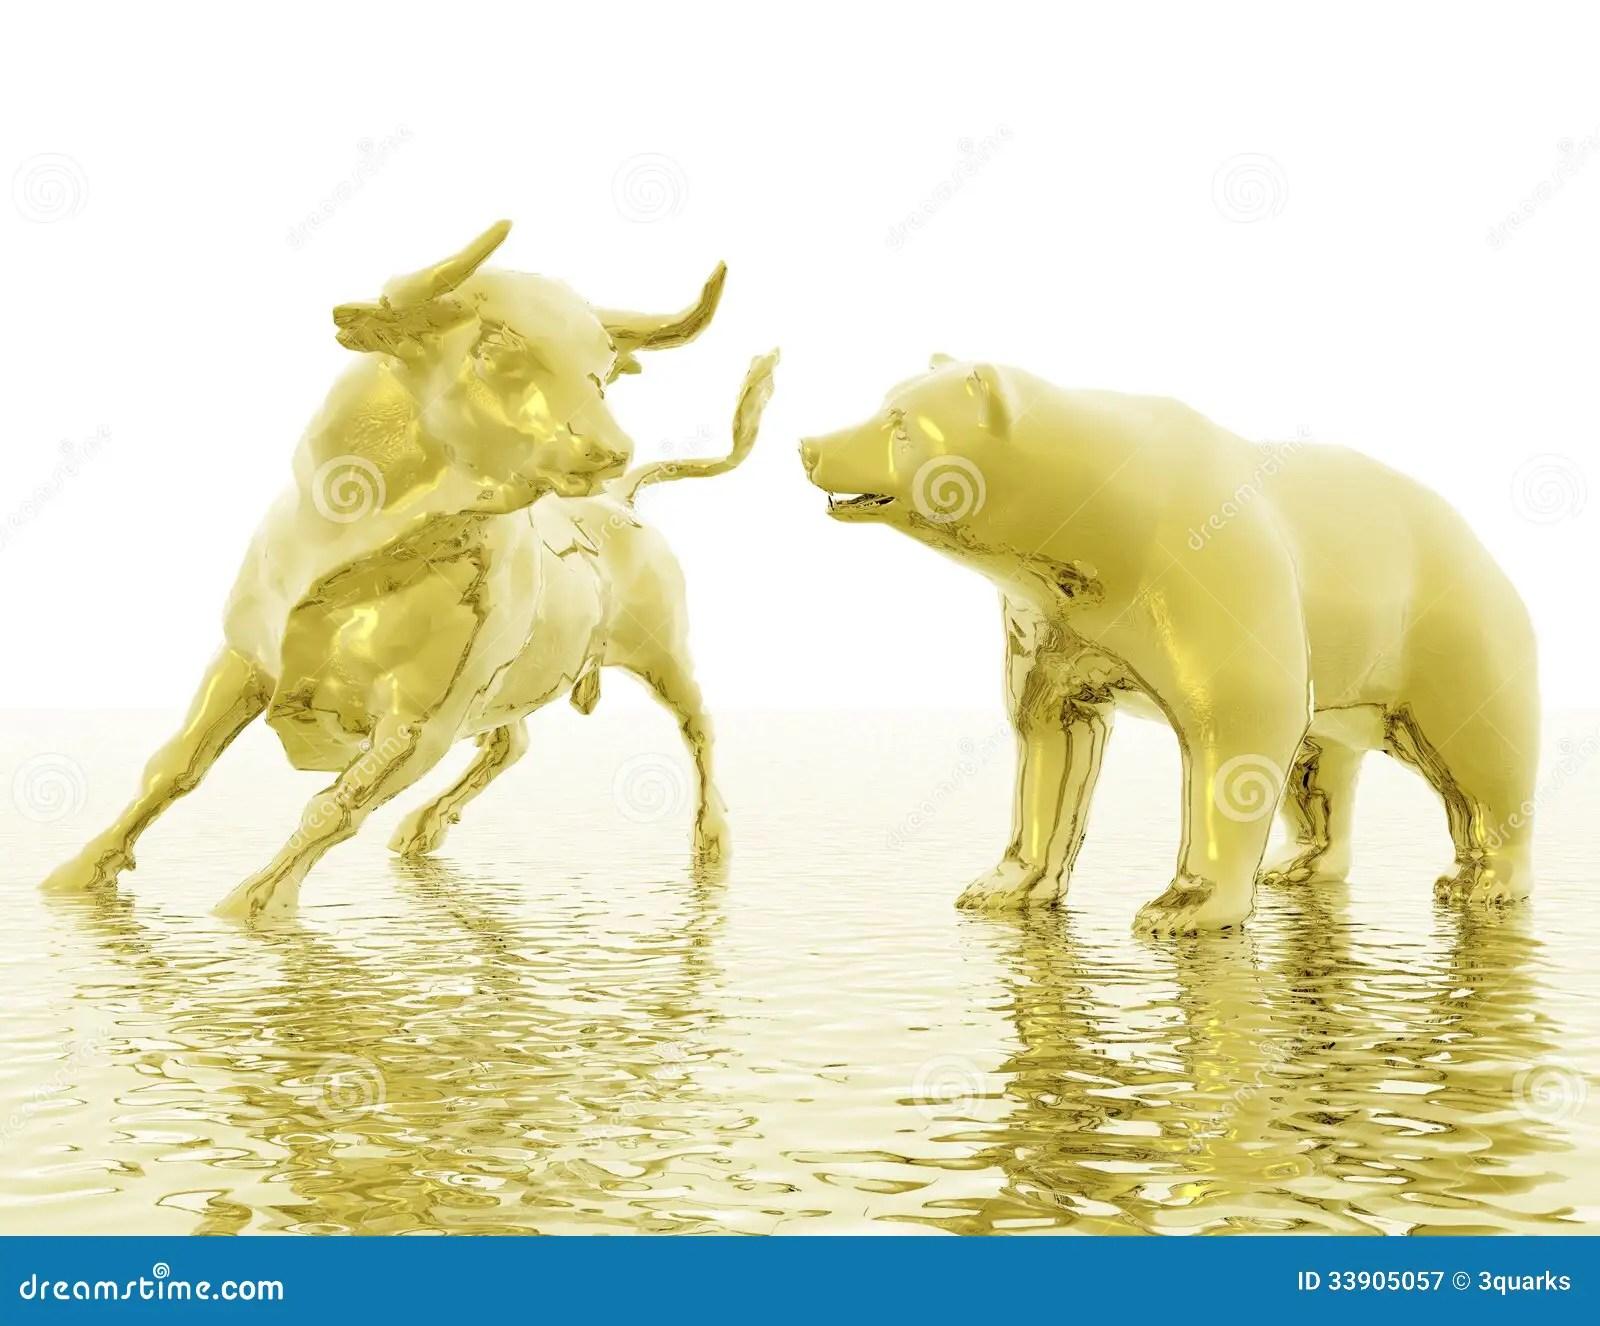 Gold 3d Wallpaper 牛市与熊市 免版税图库摄影 图片 33905057